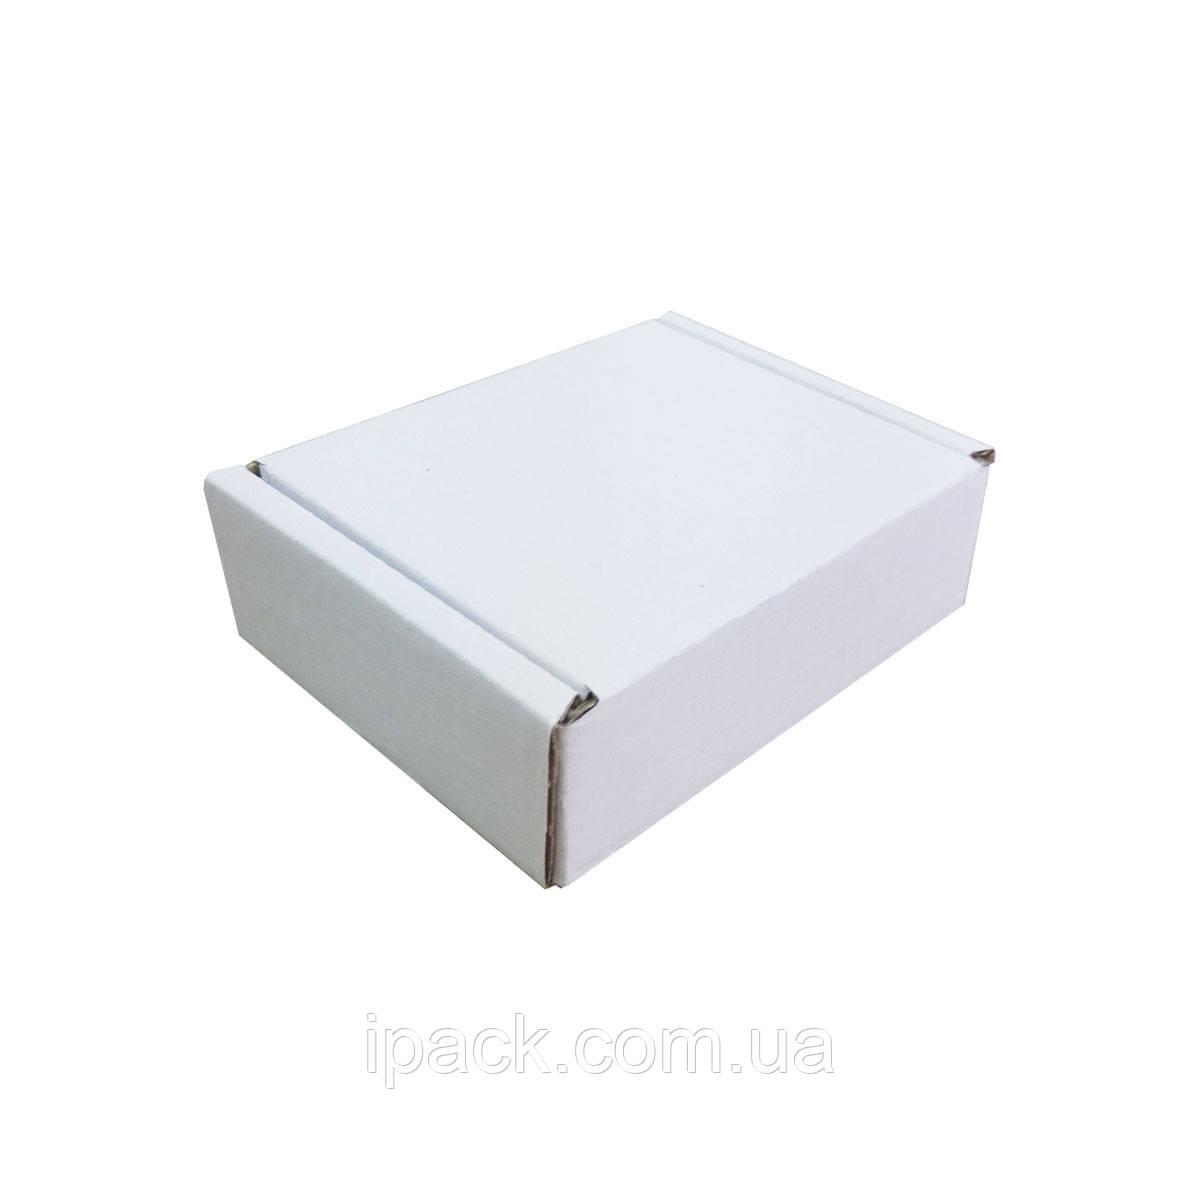 Коробка картонная самосборная, 75*45*27, мм, белая, микрогофрокартон